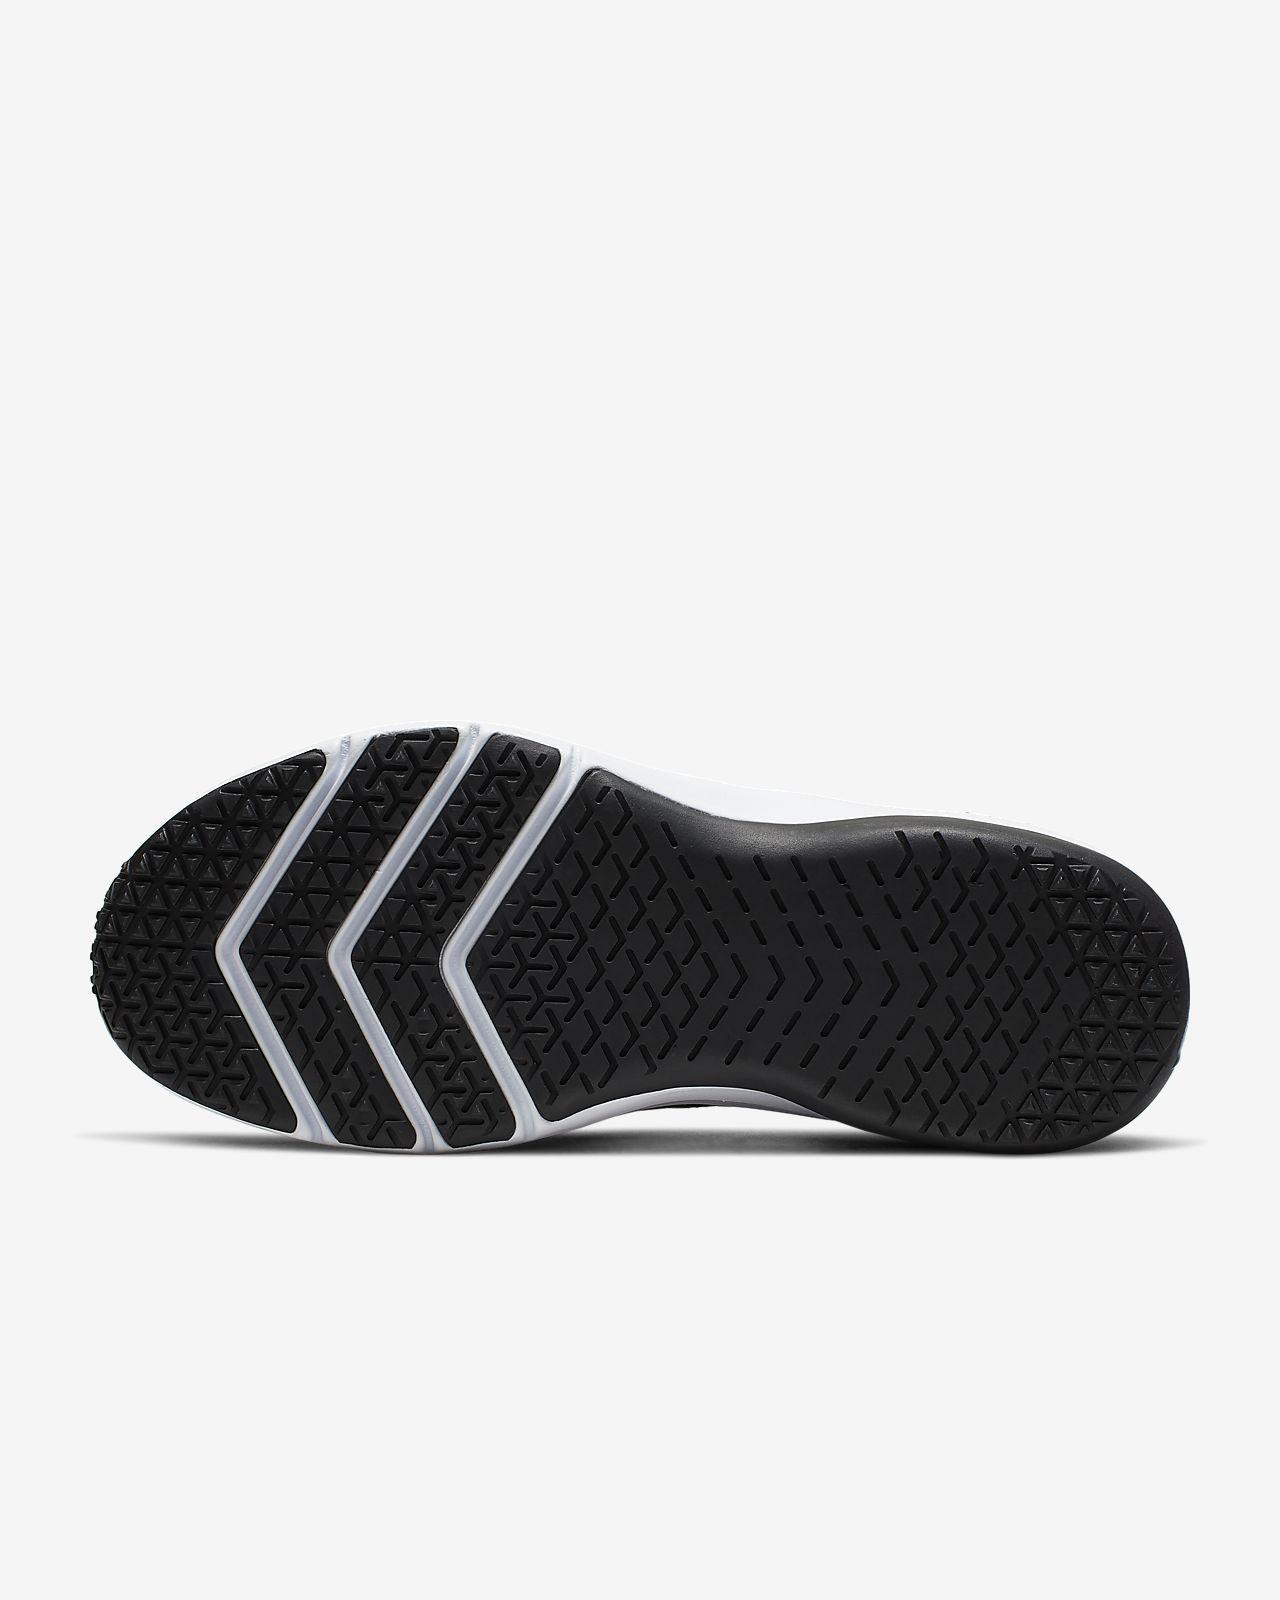 Nike Air Zoom Fearless Flyknit 2 Damenschuh für FitnessstudioTrainingBoxen